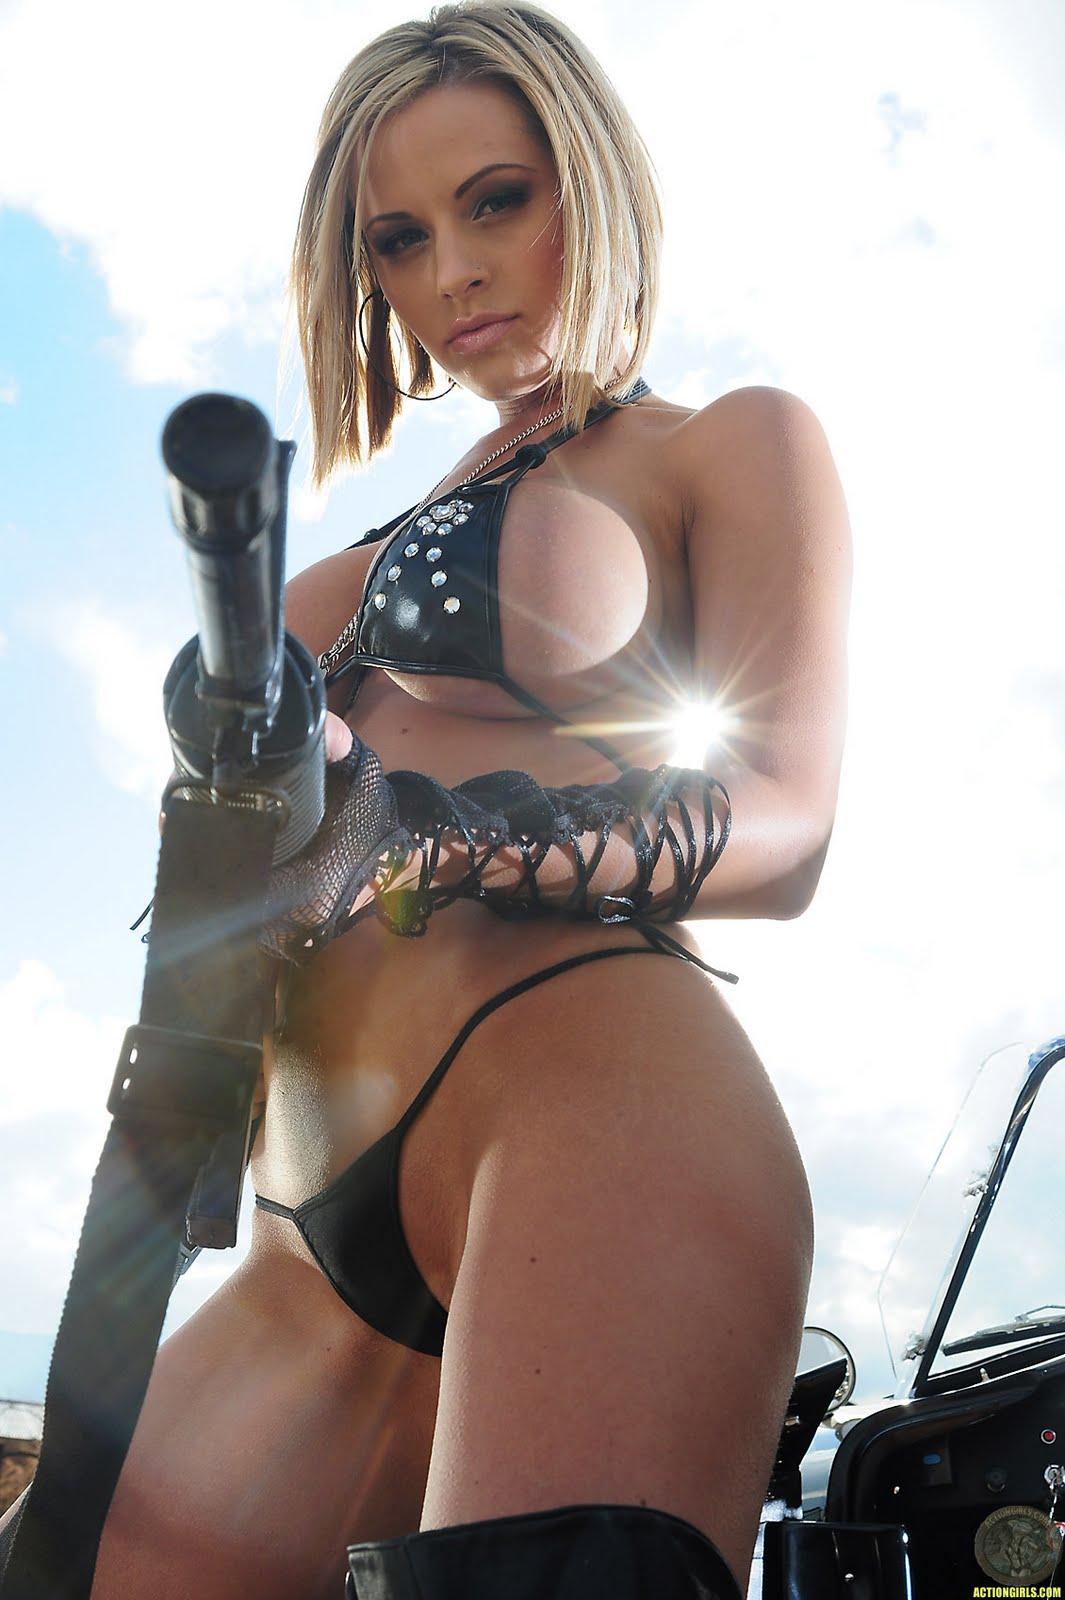 Jenny p action girls